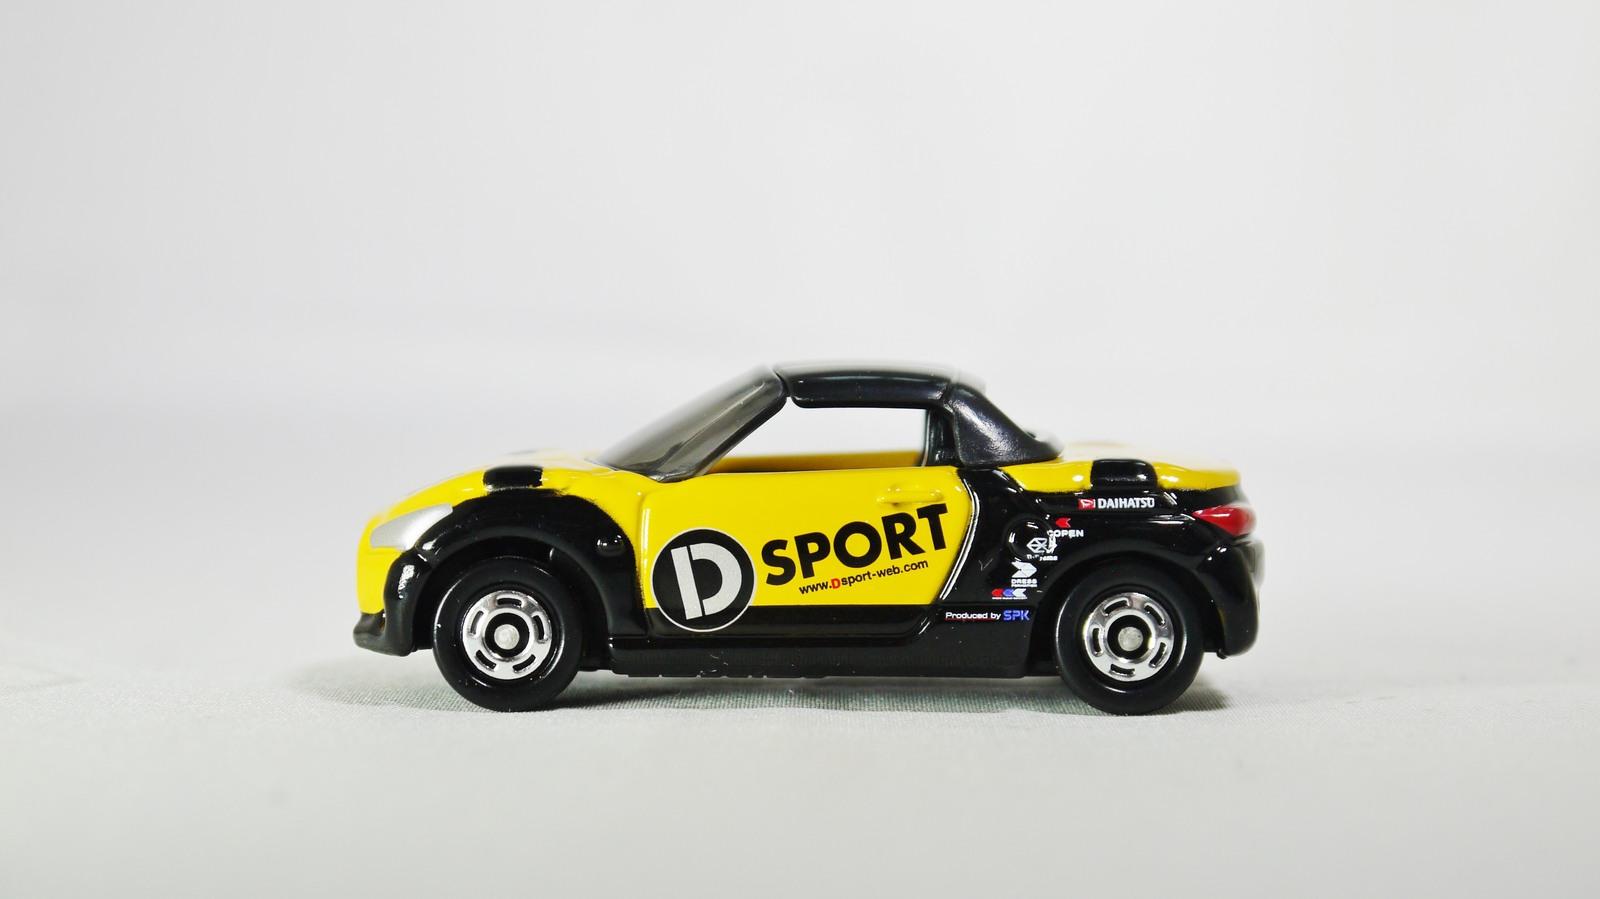 TAKARA TOMY TOMICA AEON SPECIAL Series 29 Daihatsu Copen XPLAY D-SPORT Racing